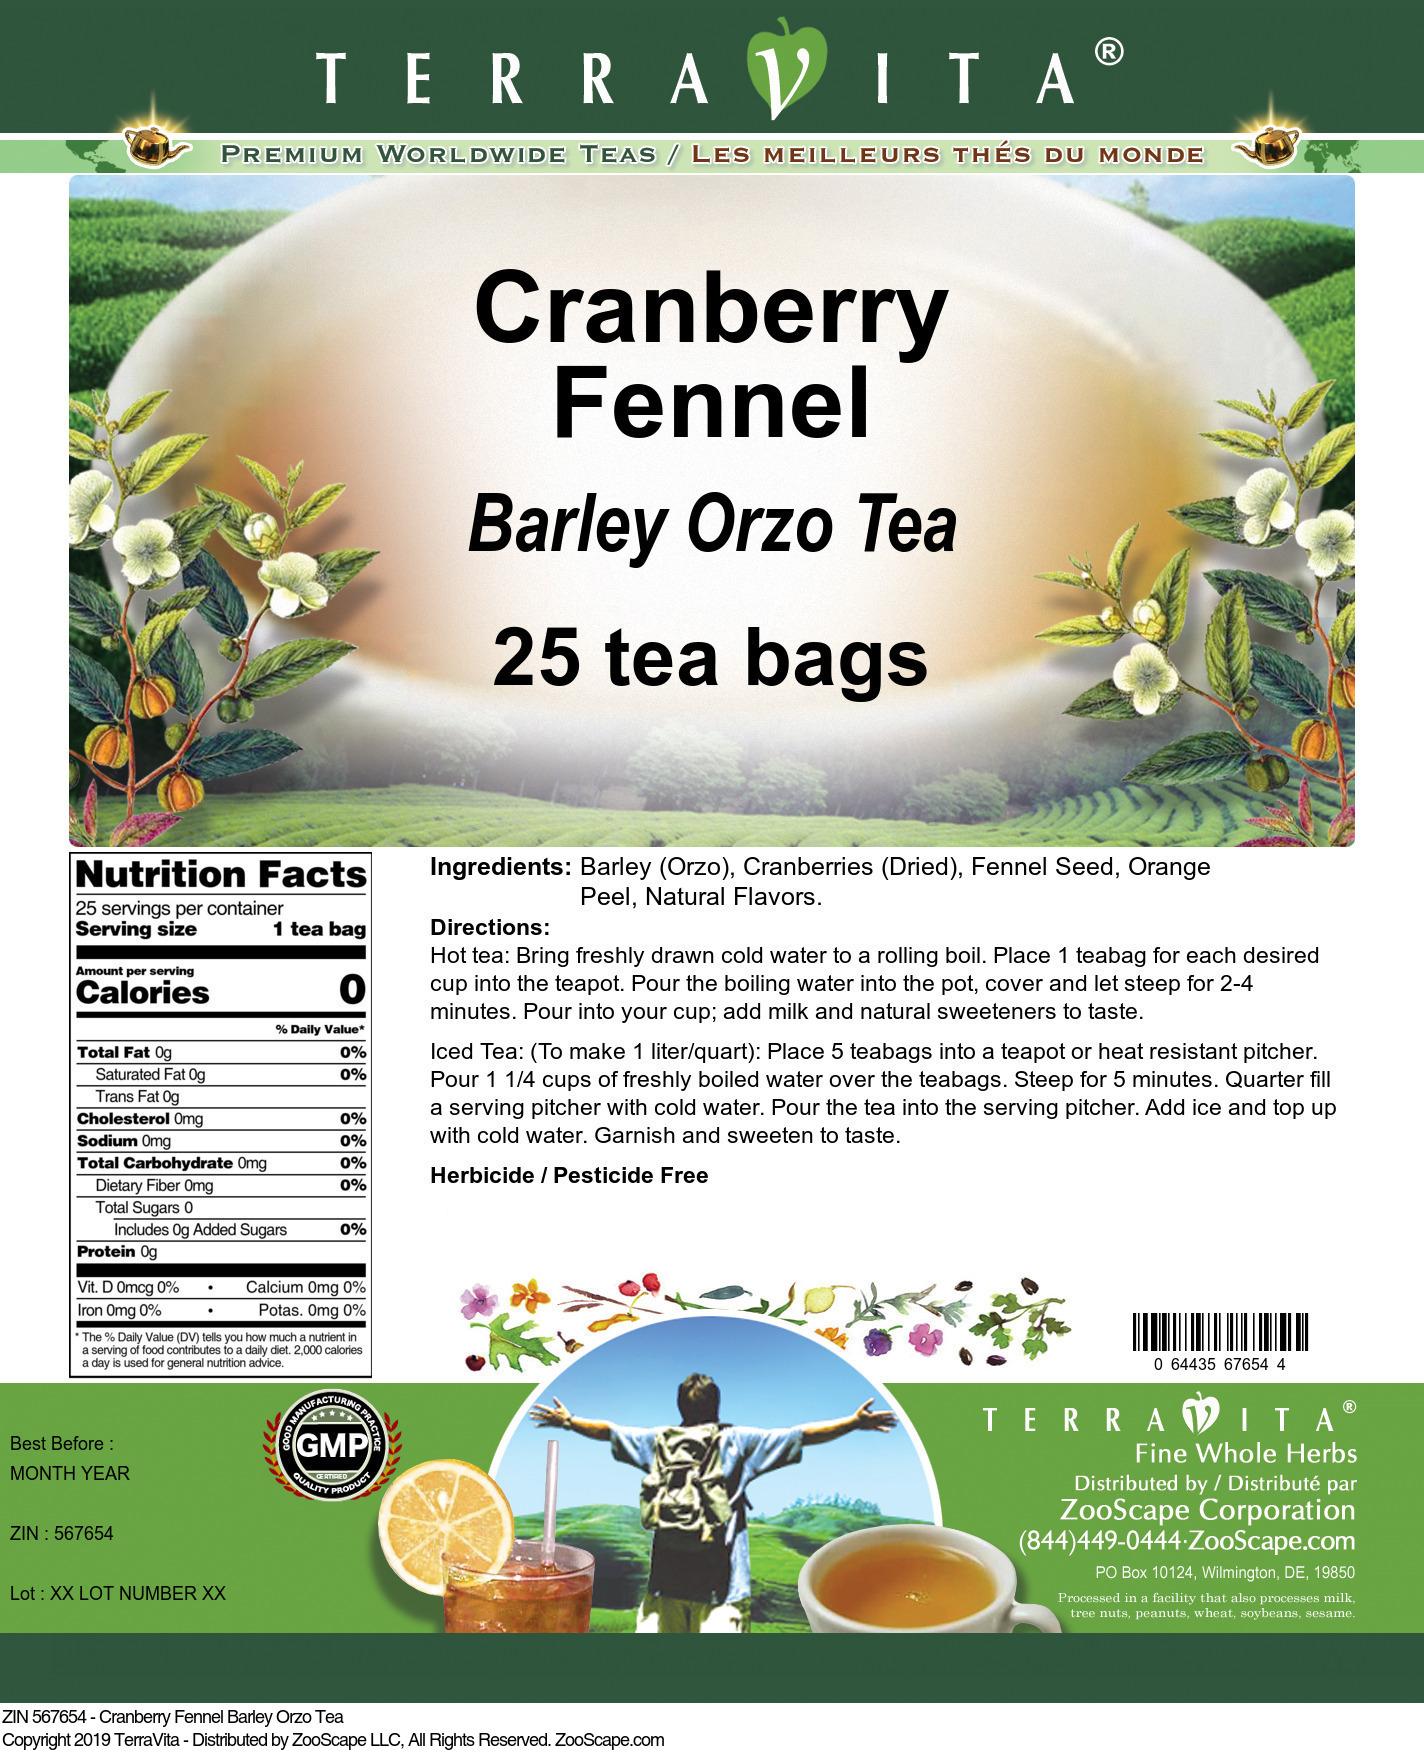 Cranberry Fennel Barley Orzo